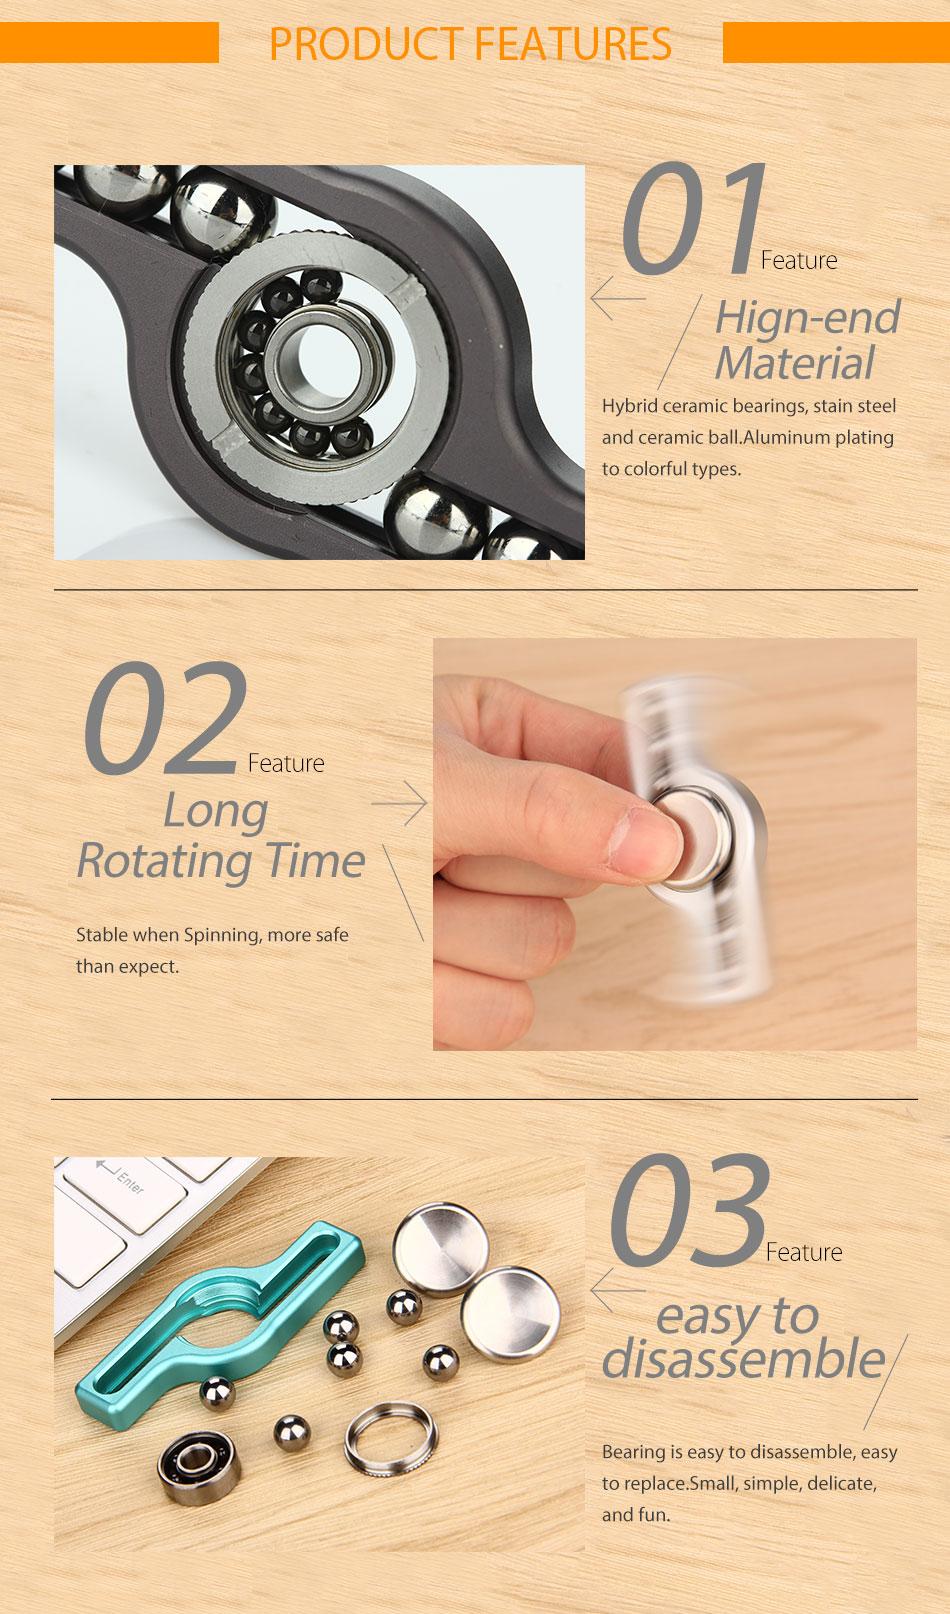 Do Dower Fidget Spinner Big Steel ball Aluminum Hand Spinner w/ Disassemble Replaceable Stain Steel & Ceramic Ball Bearing